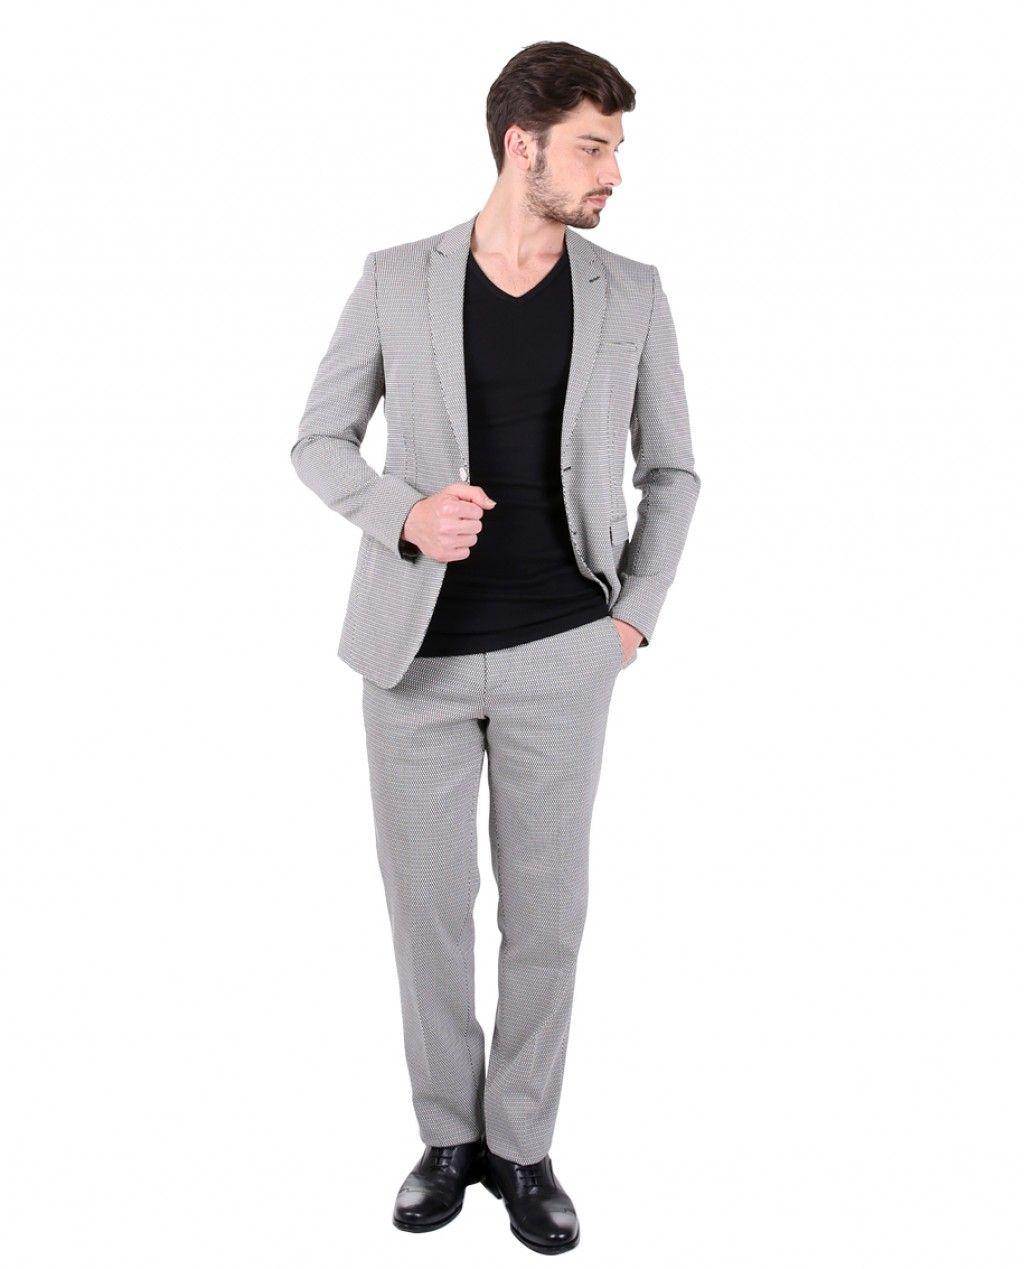 1ef059e7e0249 Toss Erkek Takım Elbise - Lacivert #gentleman #suit #takımelbise #karaca  #ciftgeyikkaraca www.karaca.com.tr